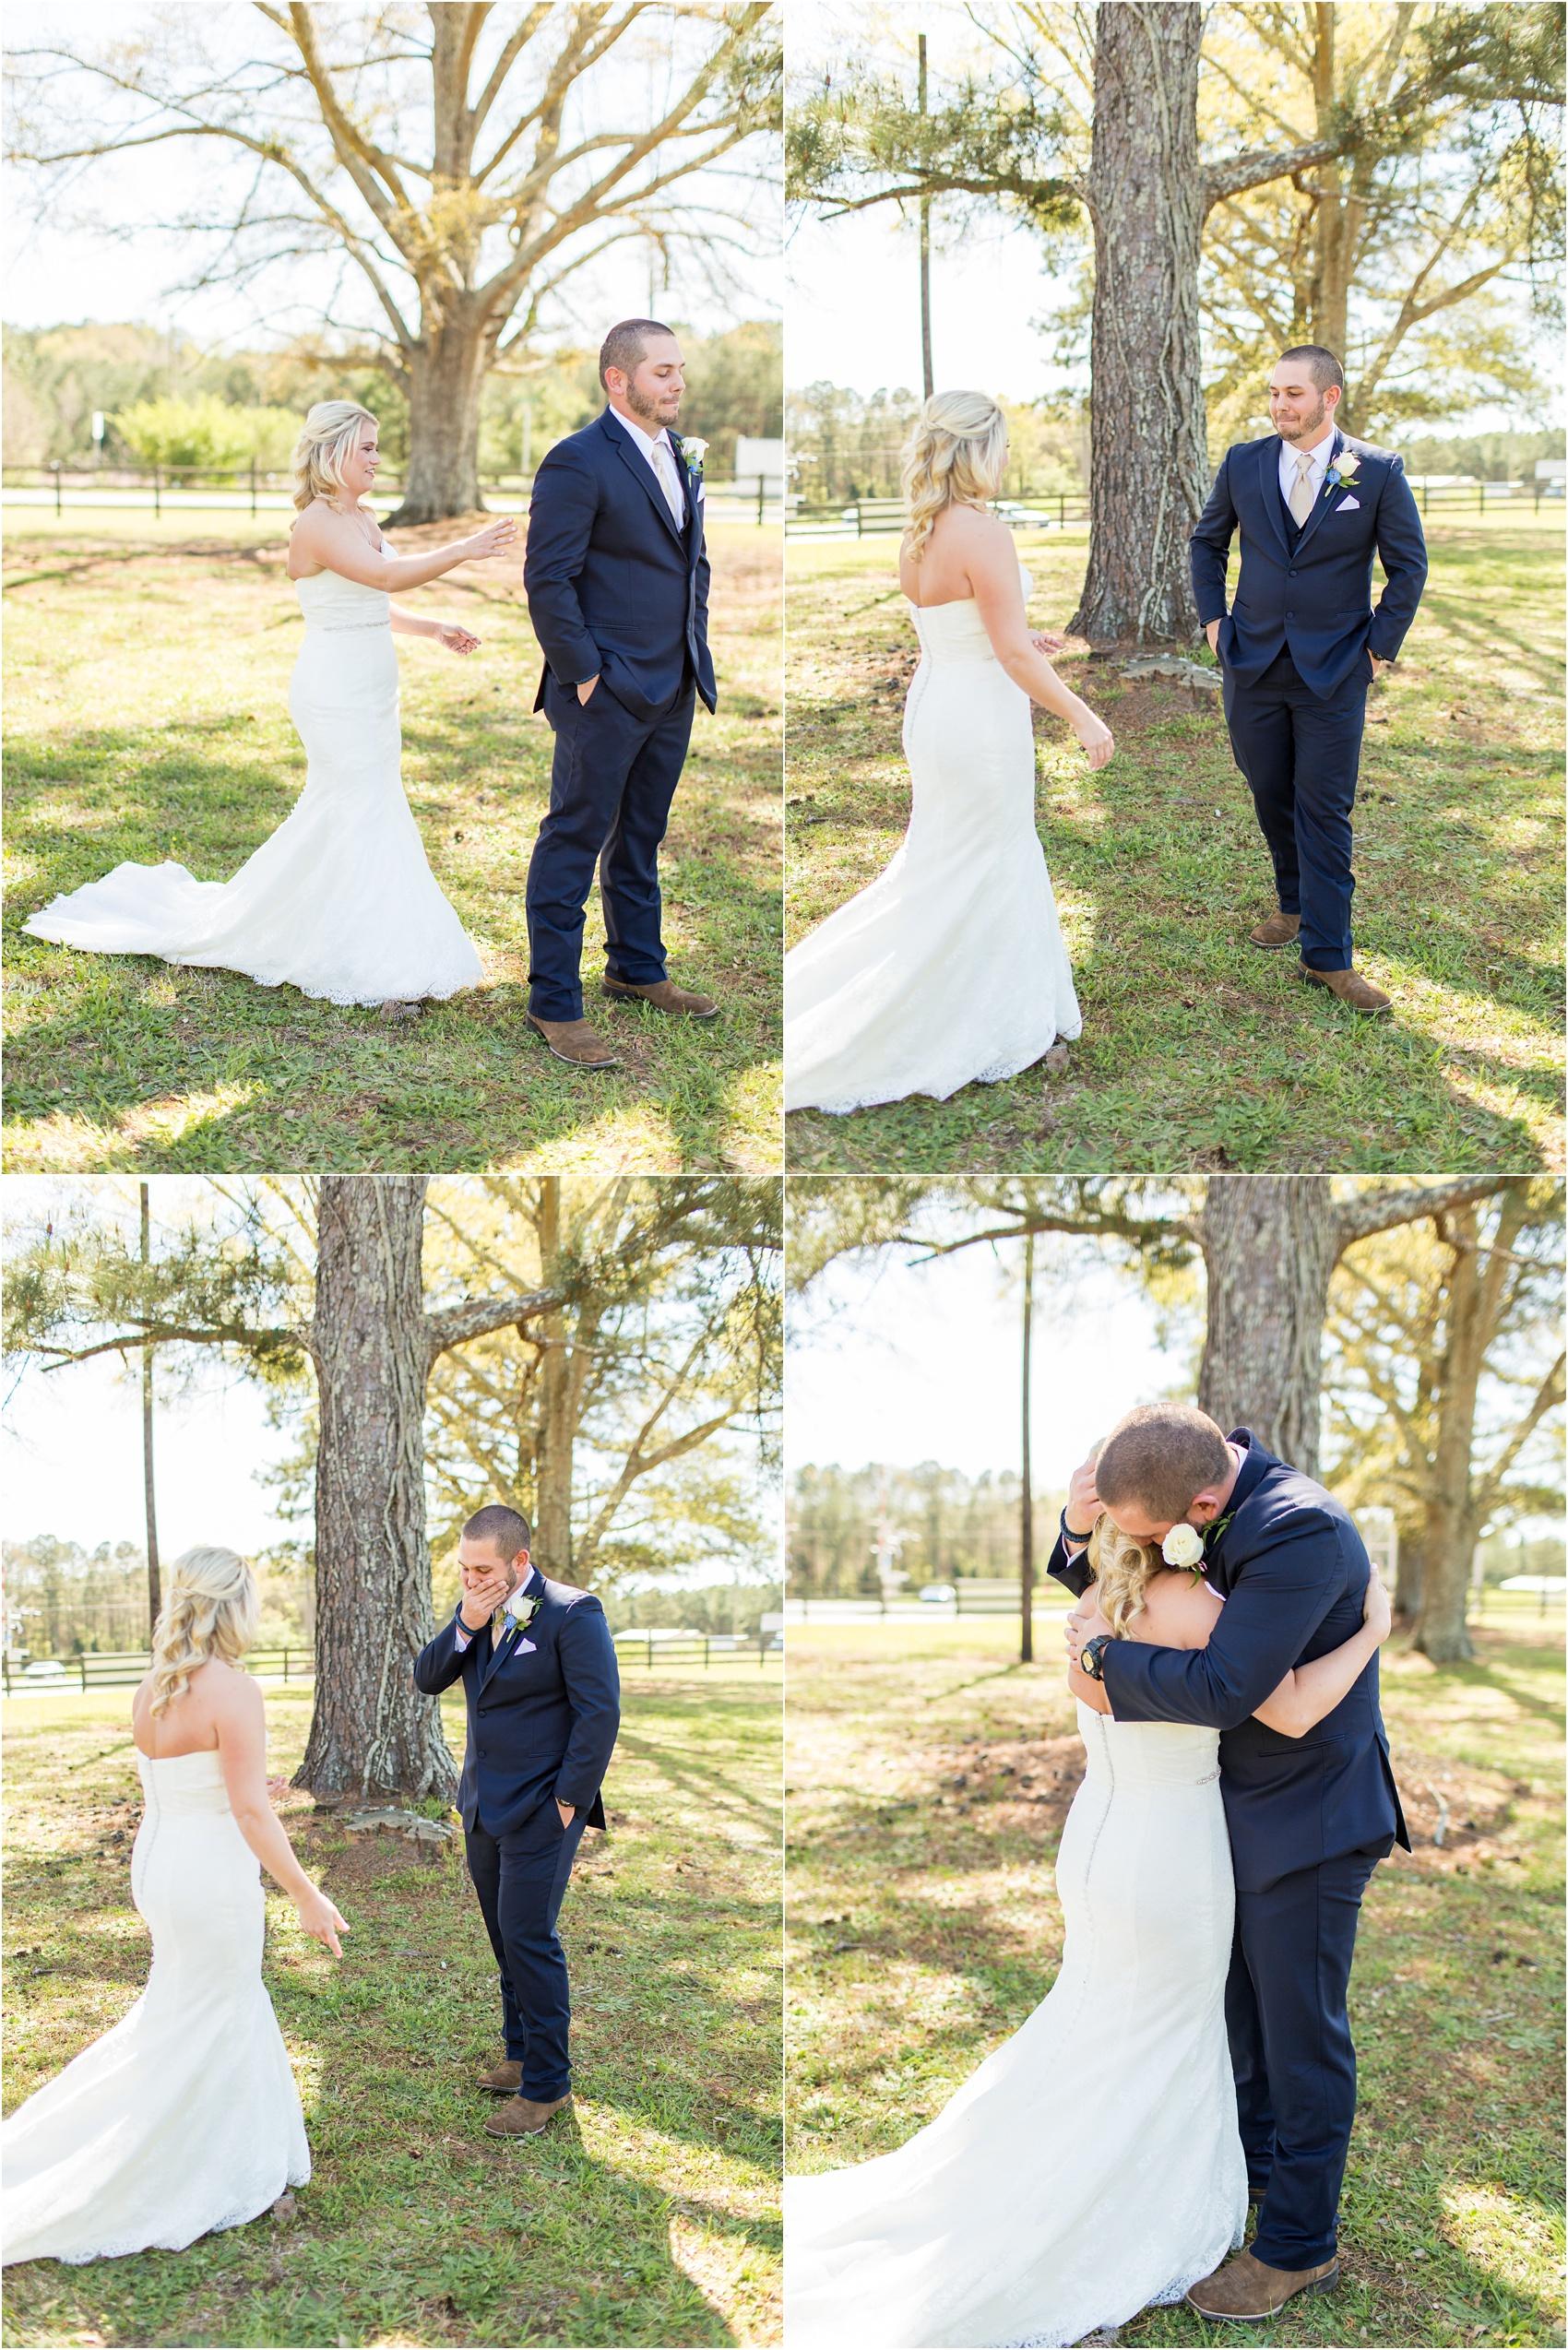 Savannah Eve Photography- Wade Wedding-18.jpg